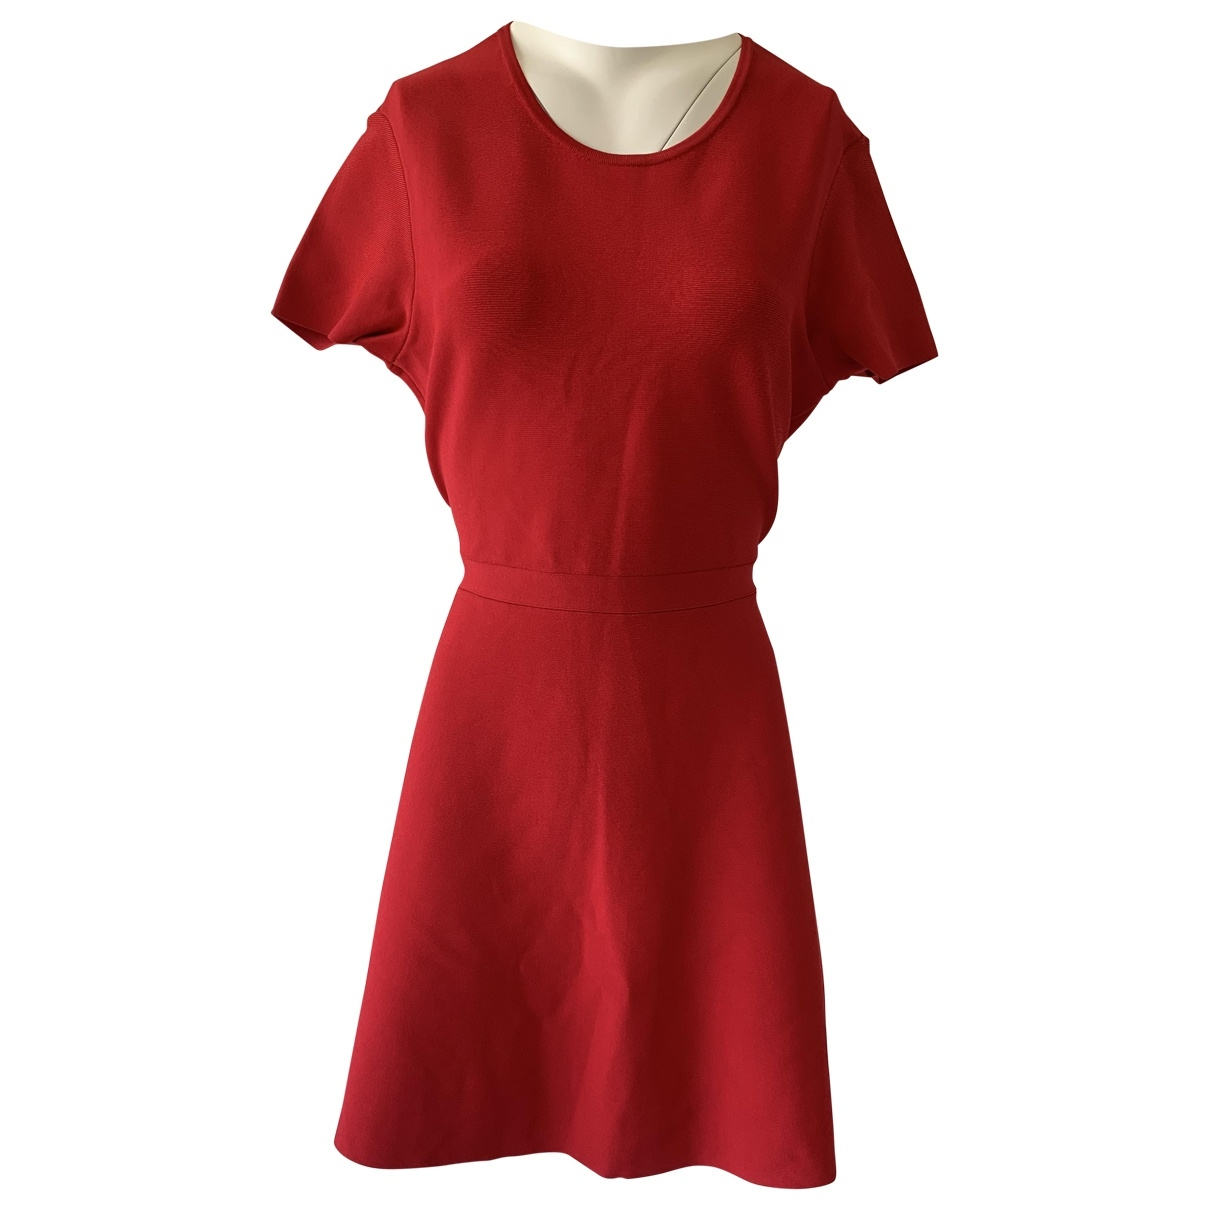 Bcbg Max Azria \N Kleid in  Rot Polyester